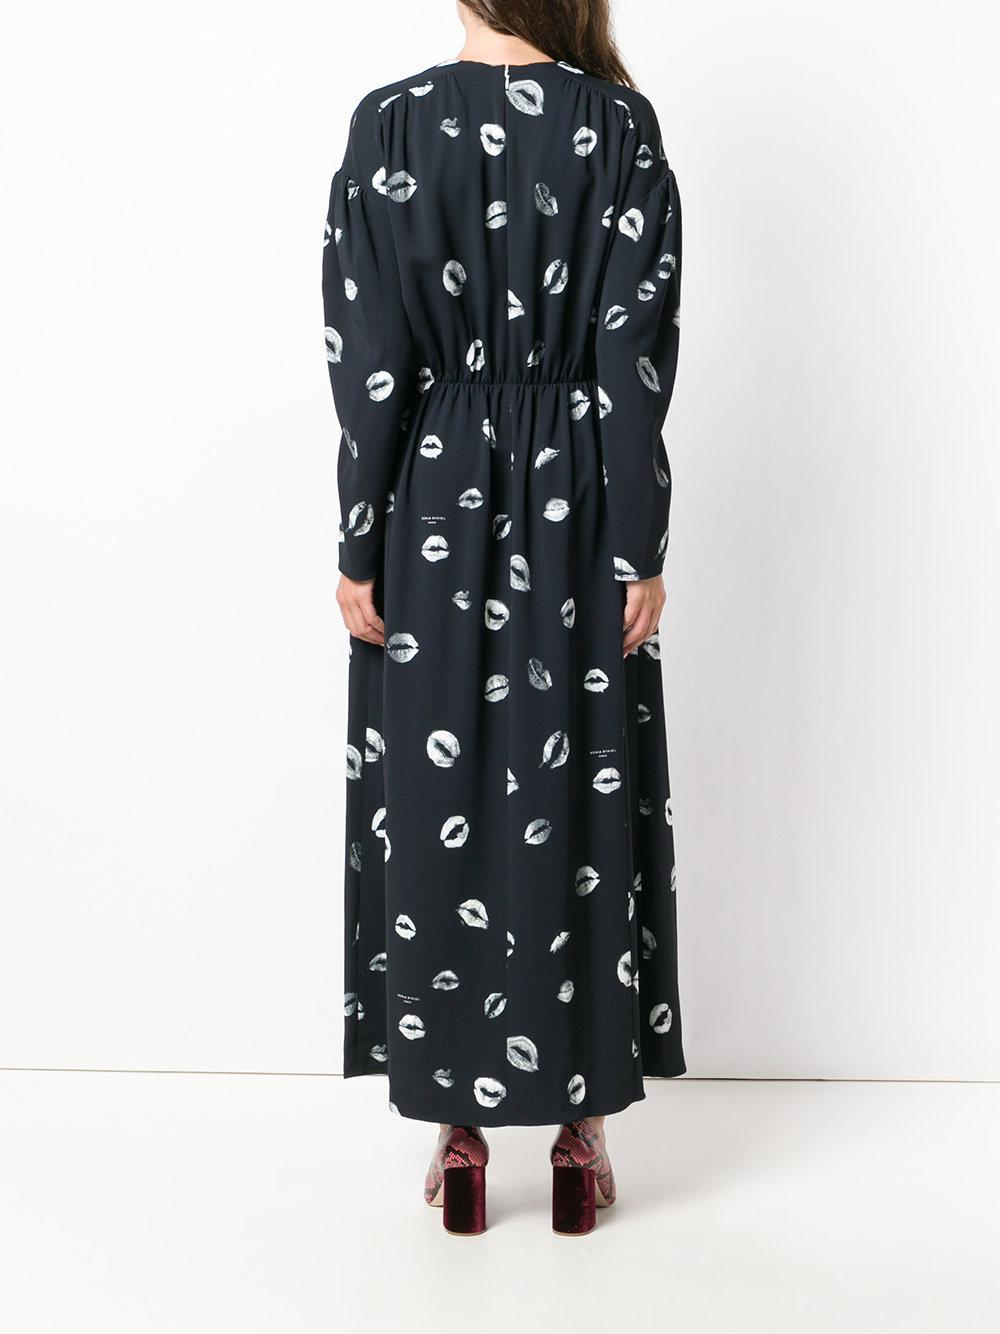 Sonia Rykiel Synthetic Lip Print Maxi Dress in Black White (Black)